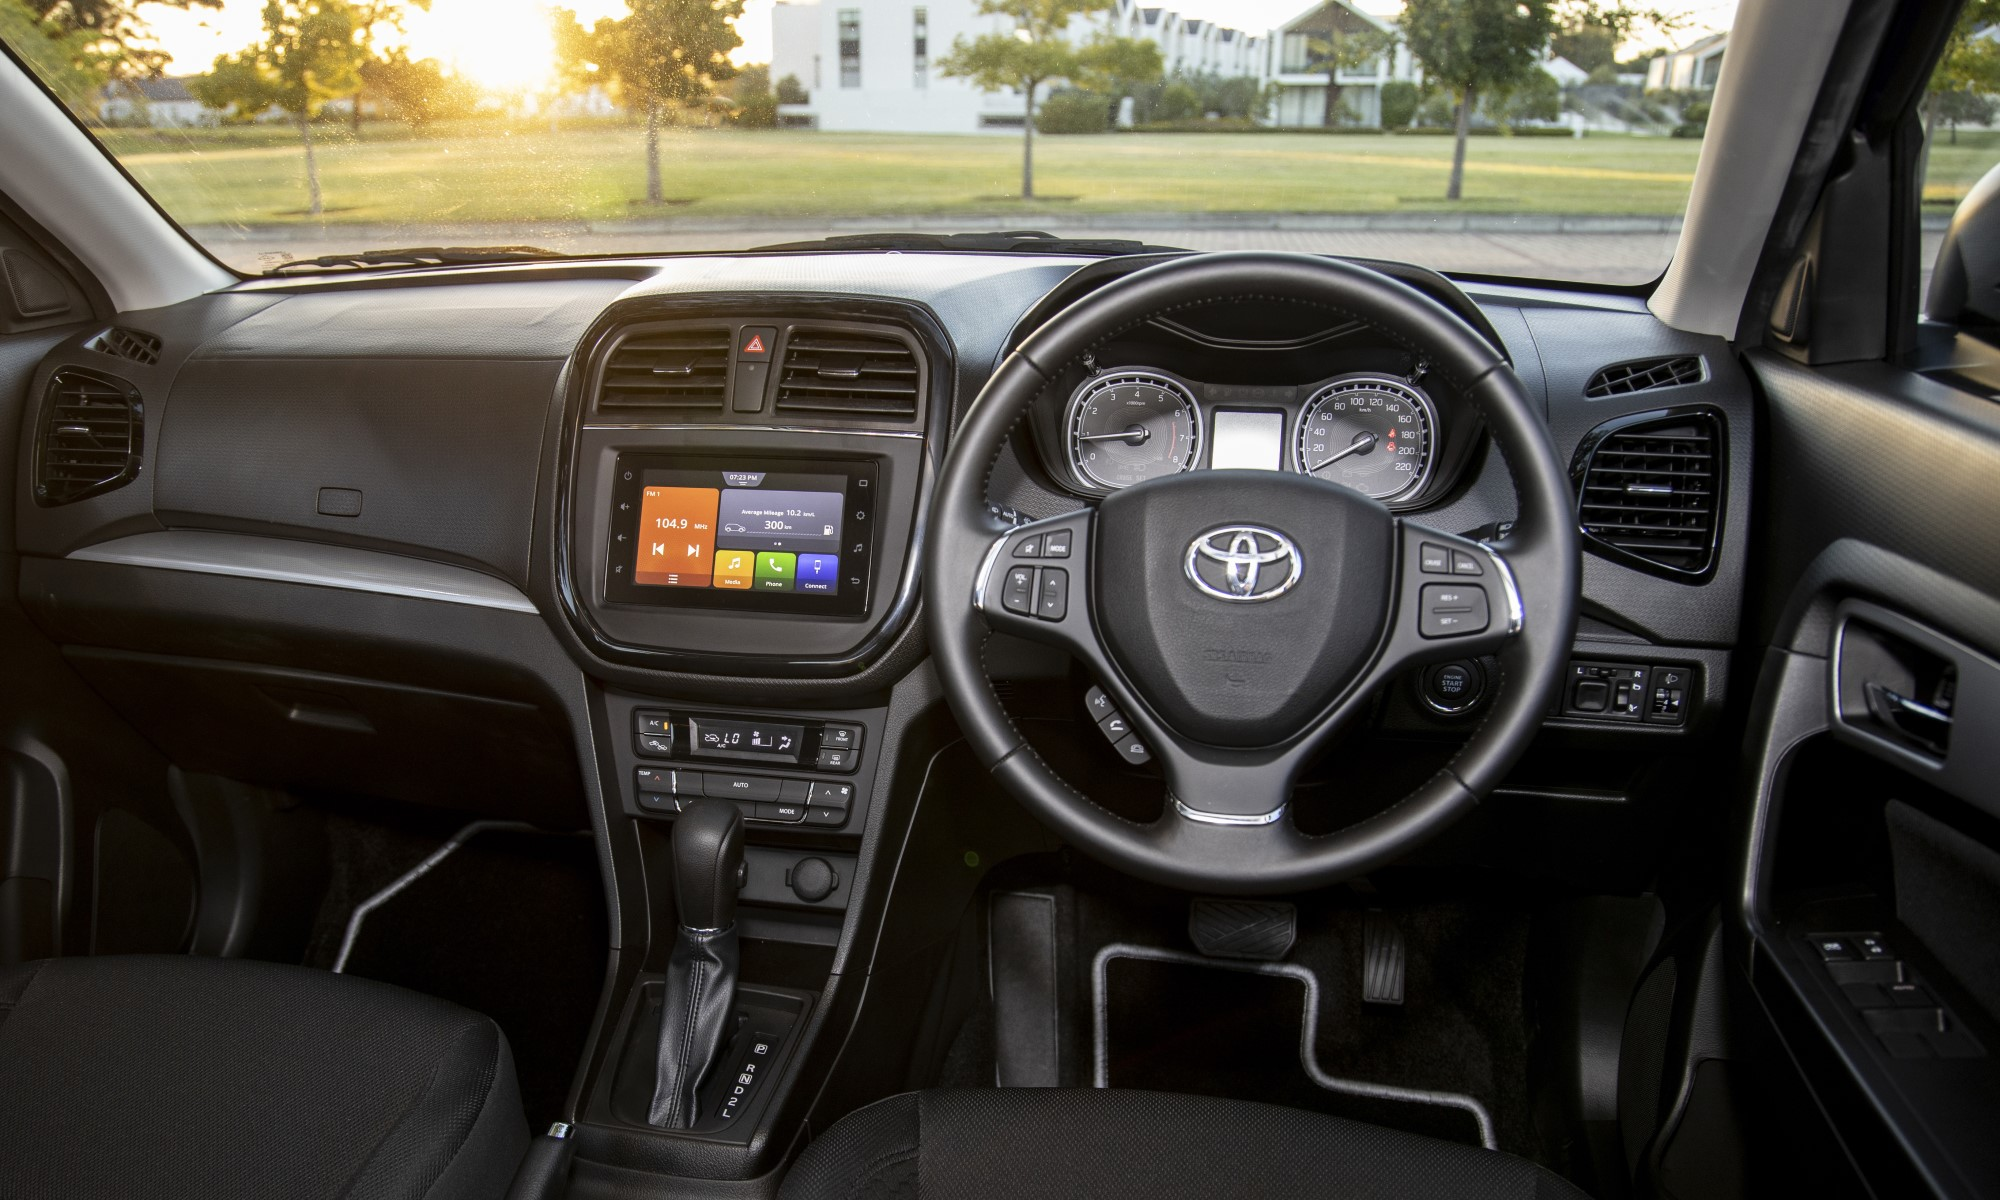 Toyota Urban Cruiser 1,5 Xr Auto interior